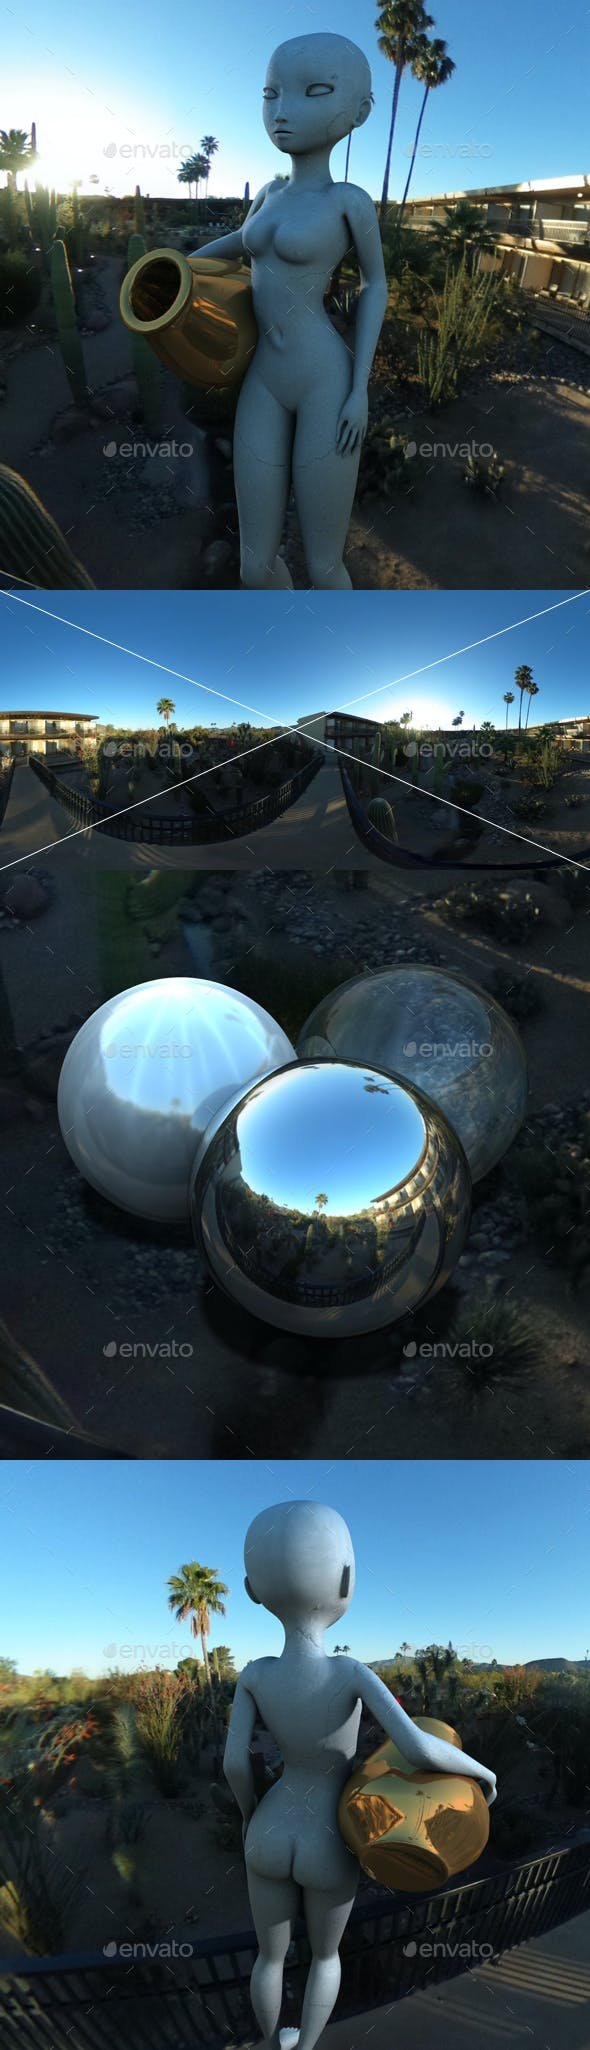 Desert Hotel Bridge HDRI - 3DOcean Item for Sale